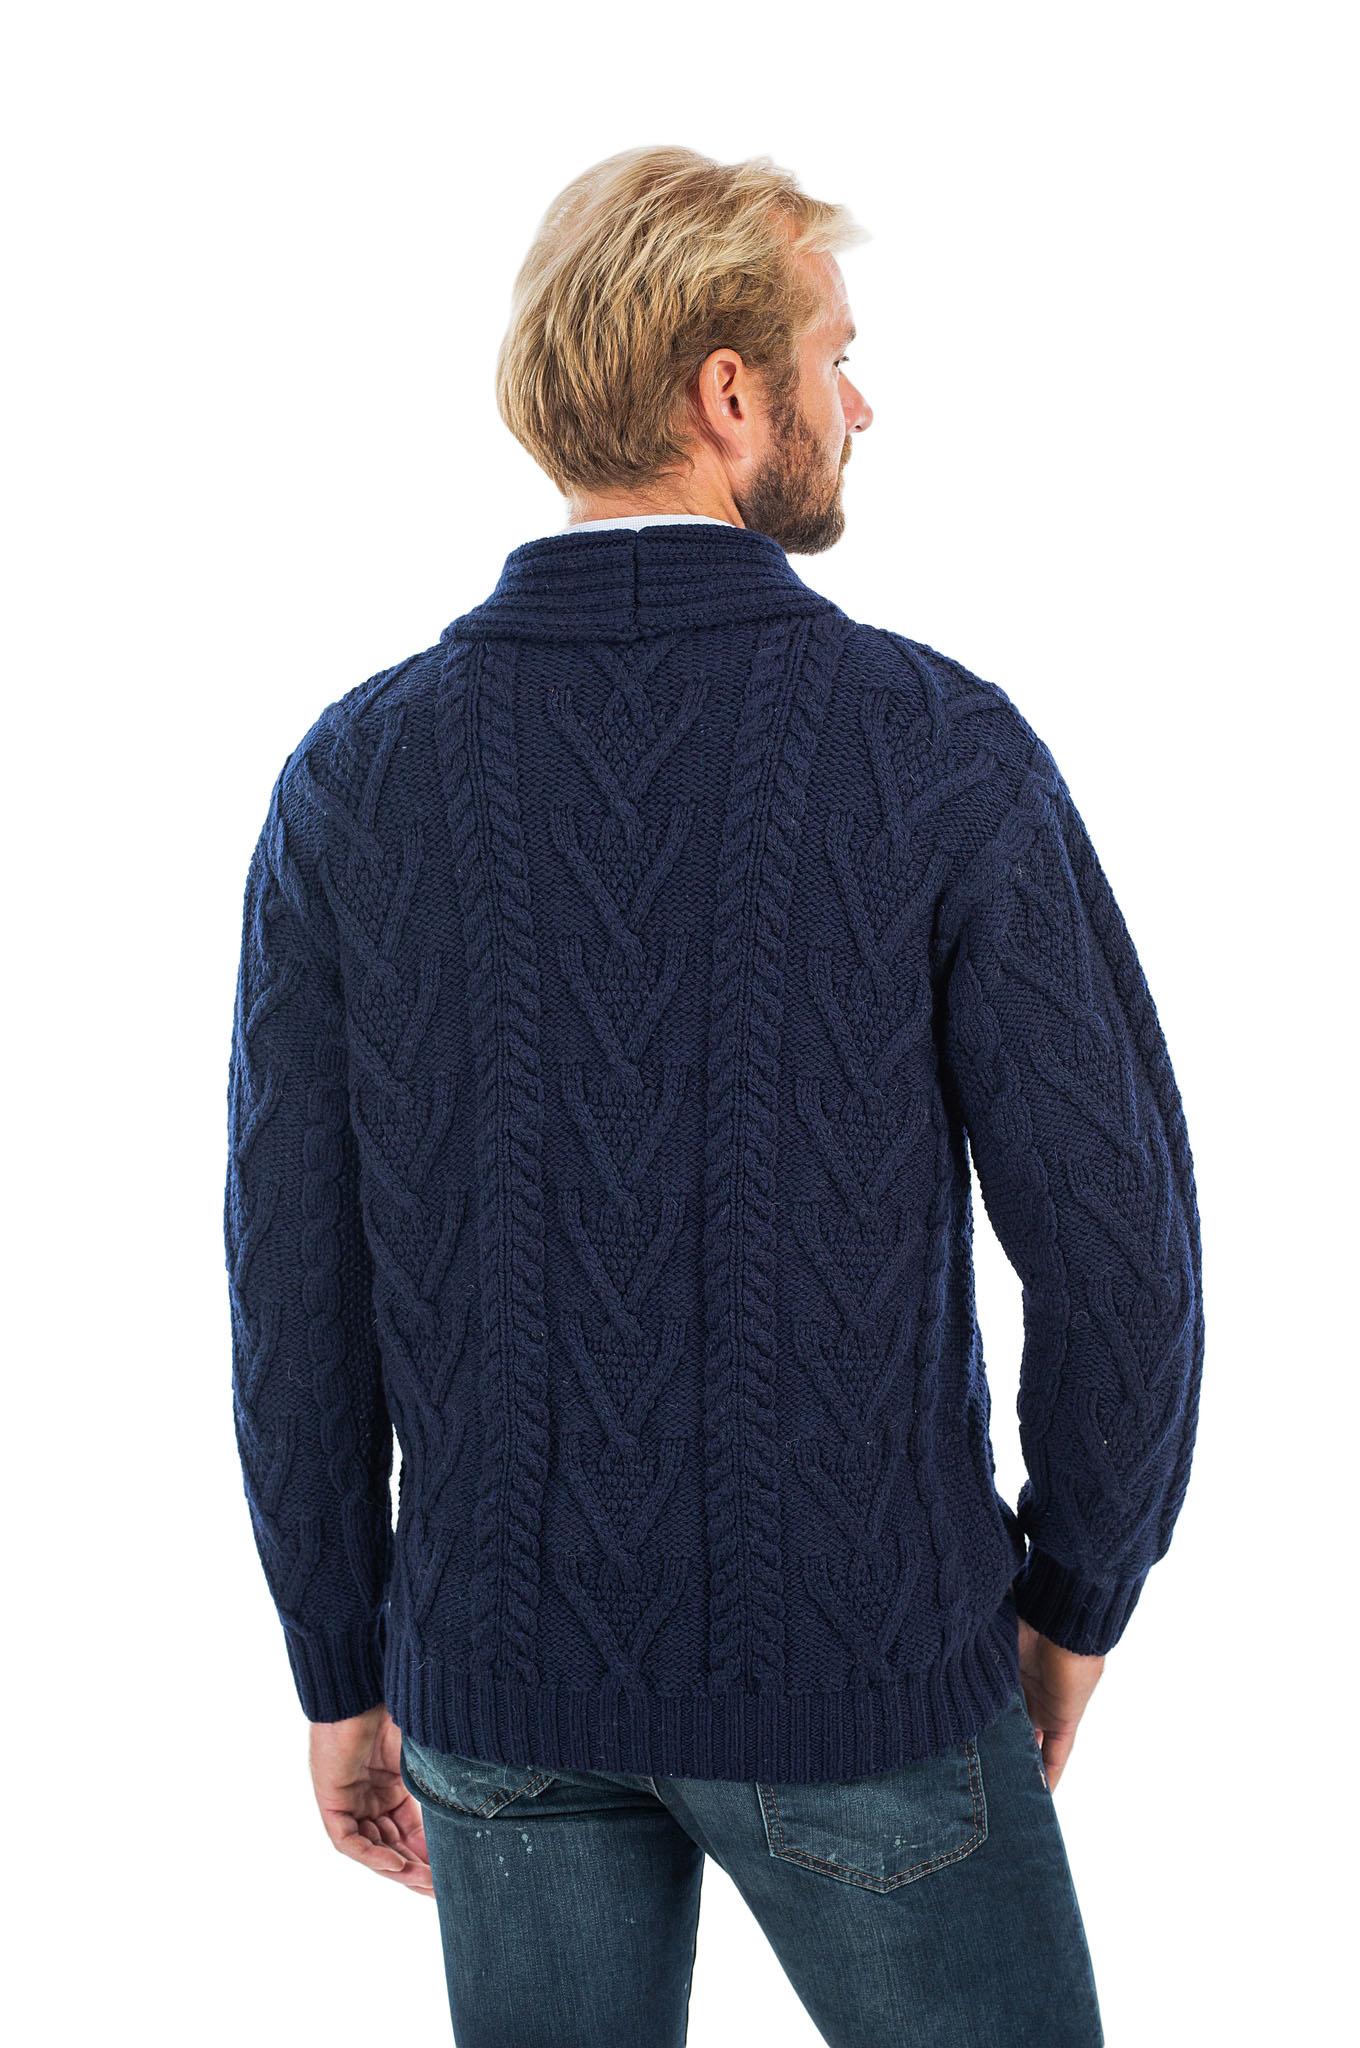 SAOL-Mens-Irish-Merino-Wool-Cardigan-Shawl-Collar-Front-Pockets-Aran-Cable-Knit thumbnail 27